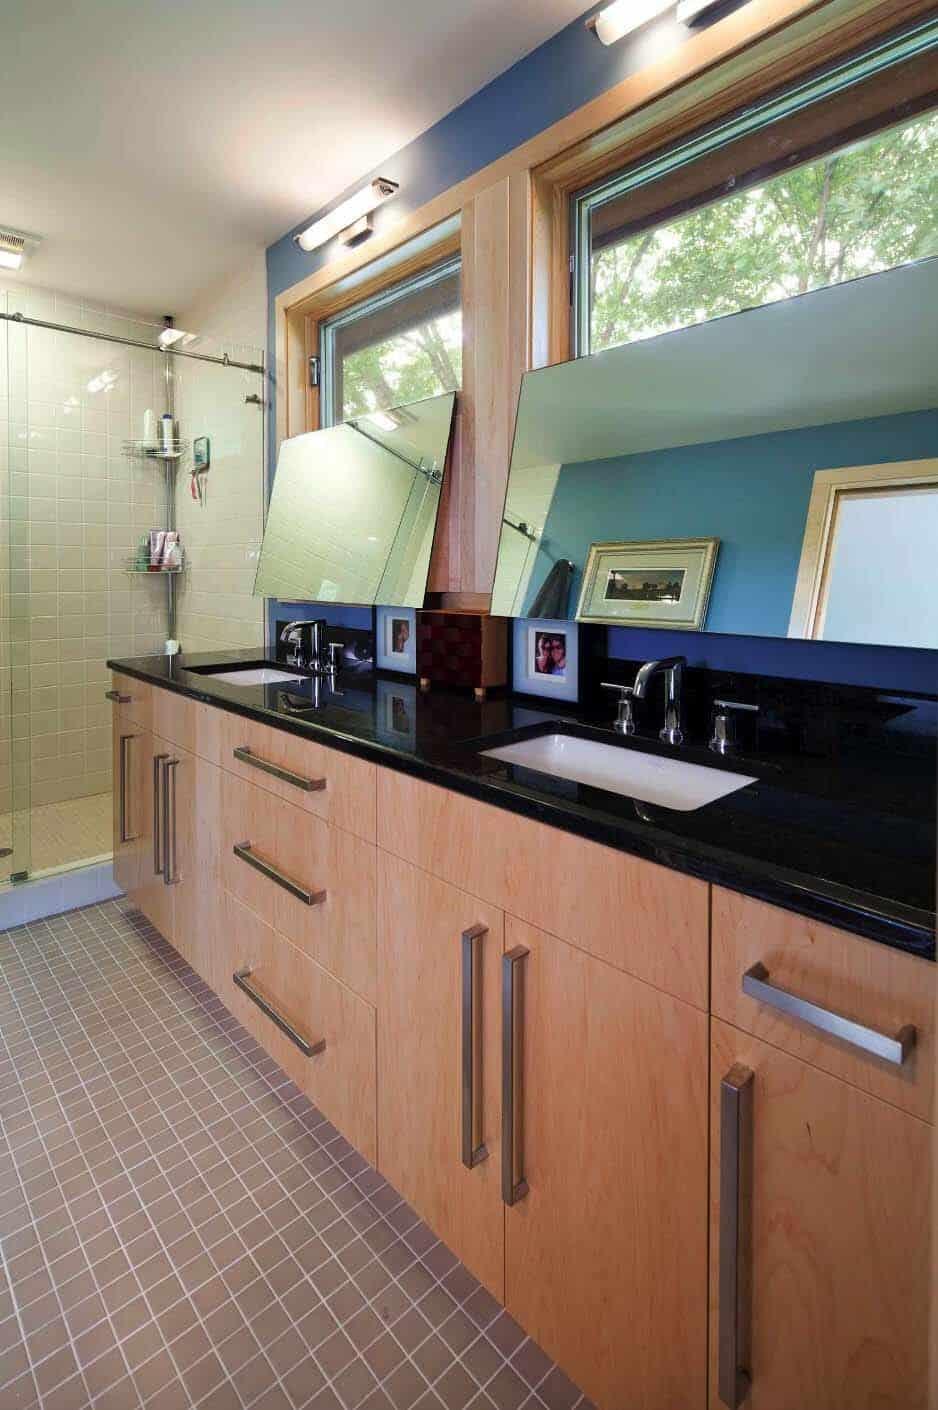 Modern Sustainable Home-LEED-SALA Architects-13-1 Kindesign